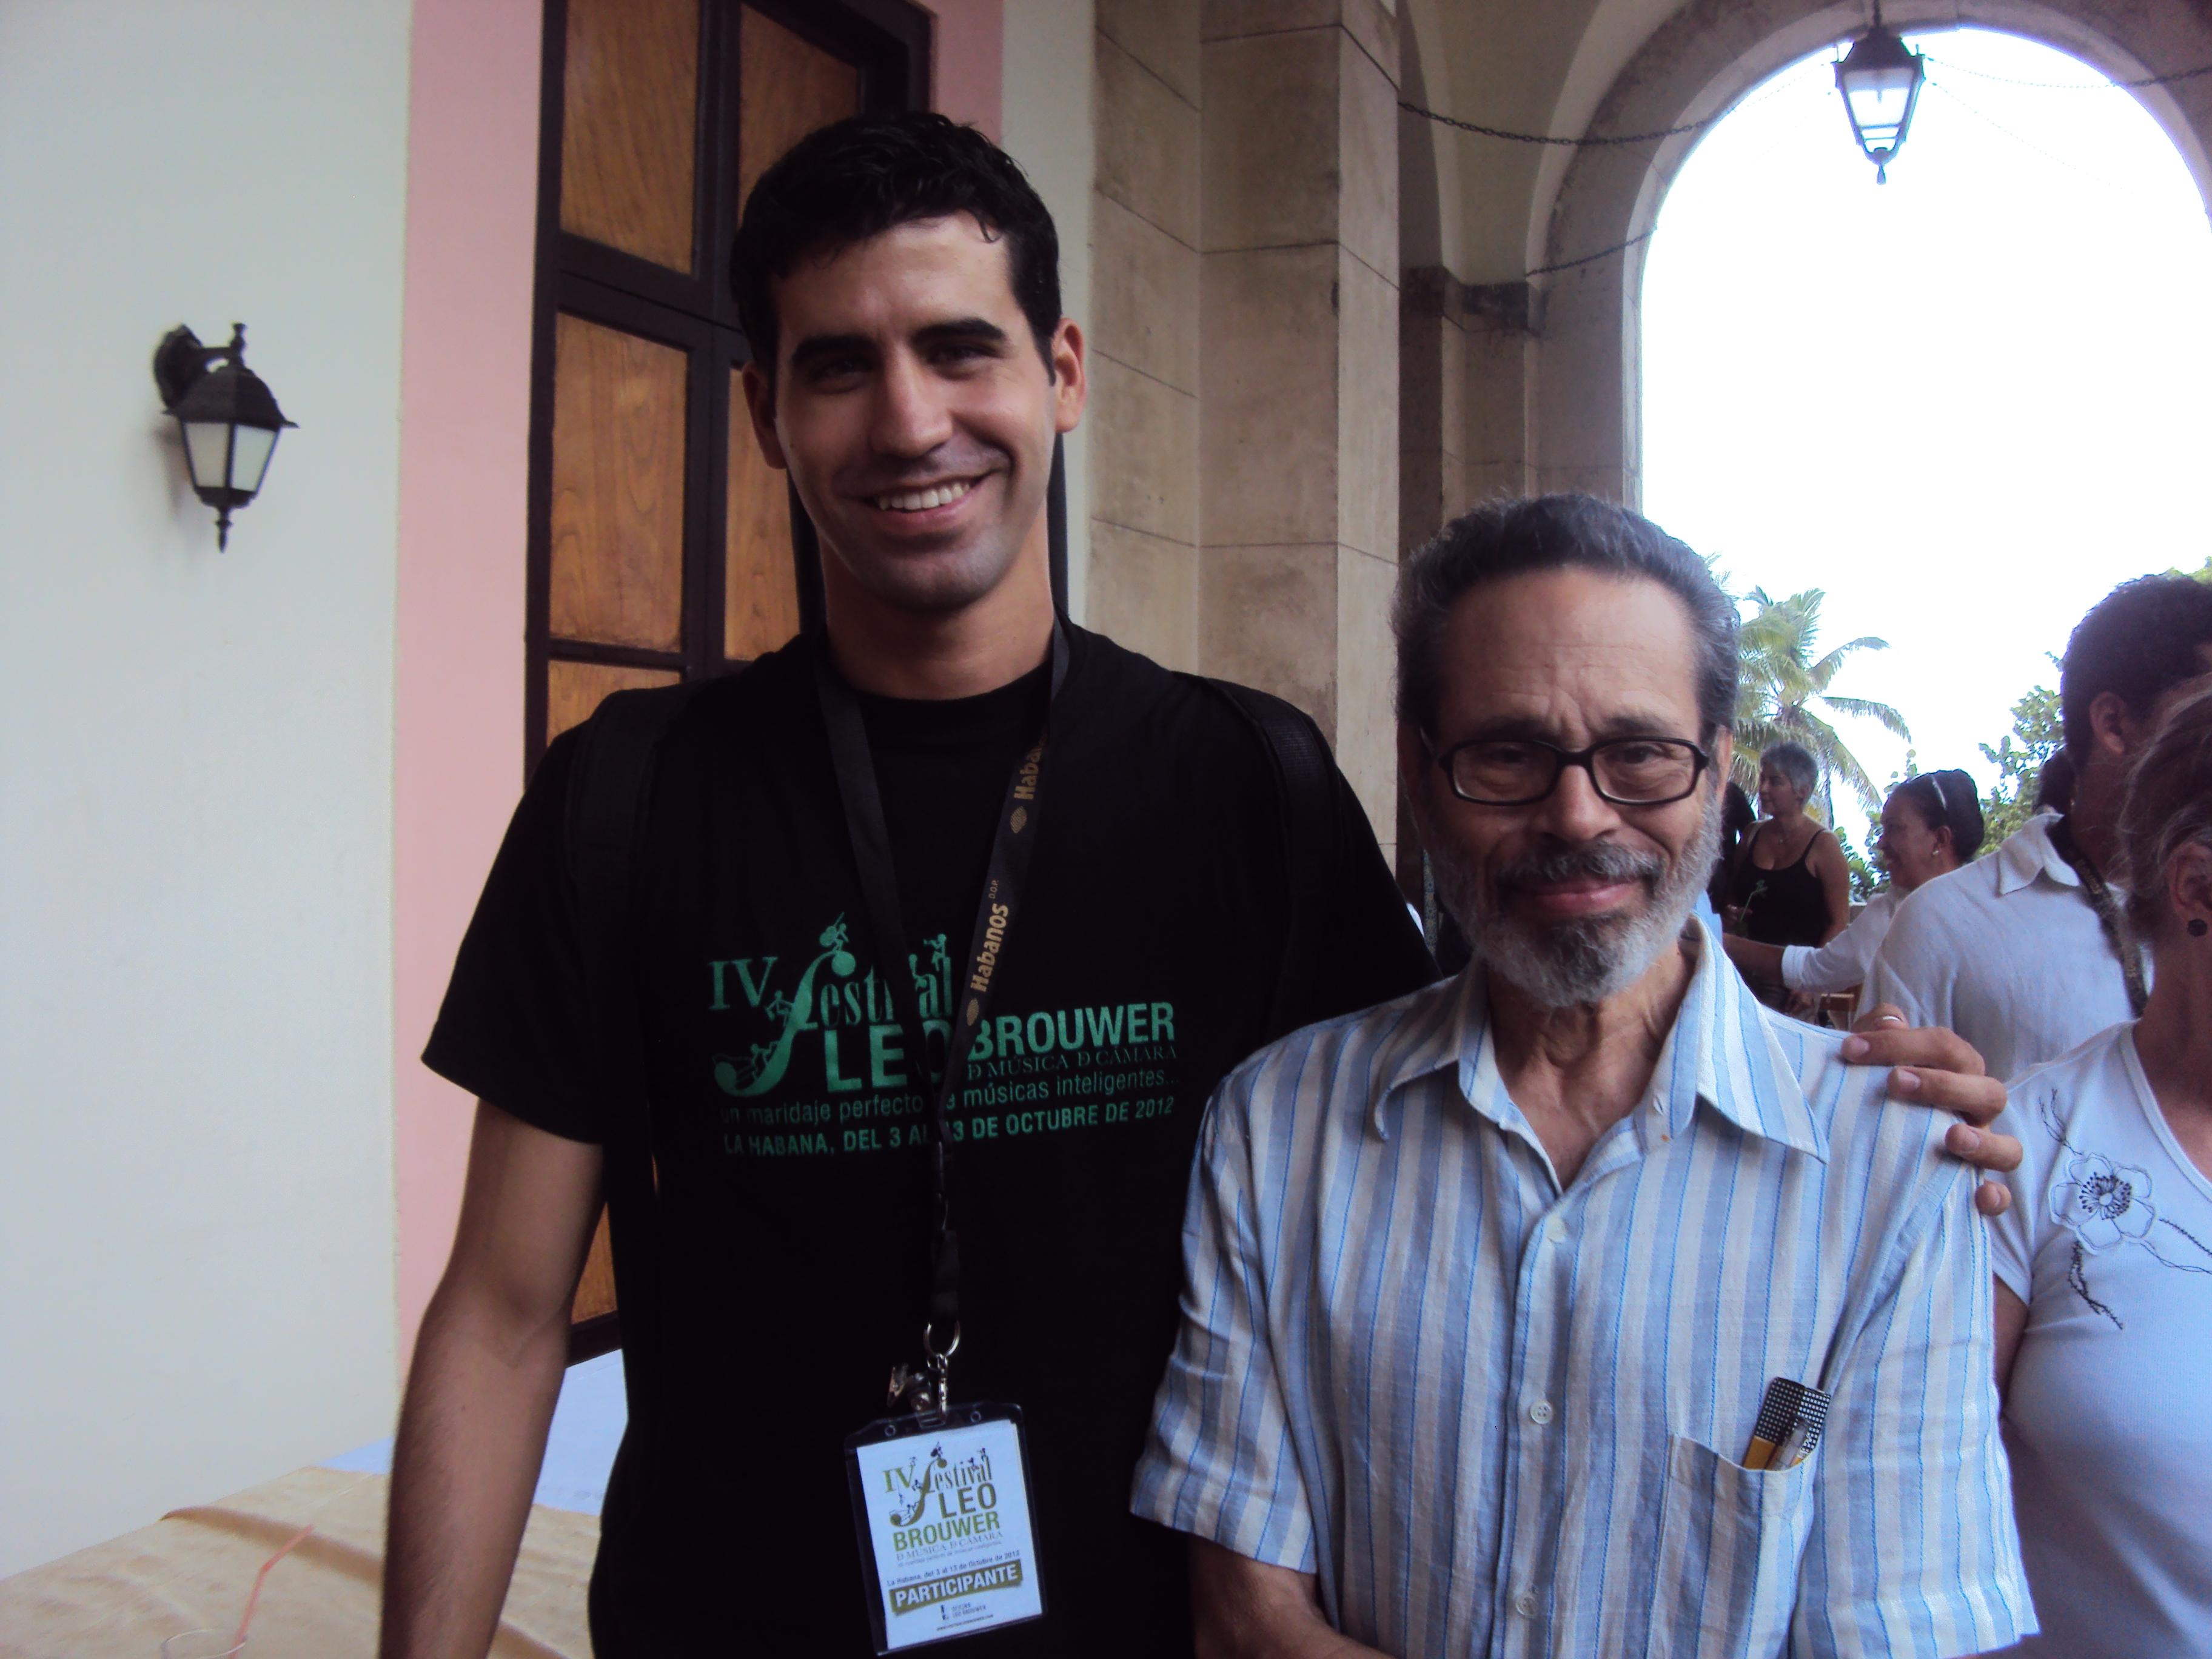 Joe Ott y Leo Brouwer